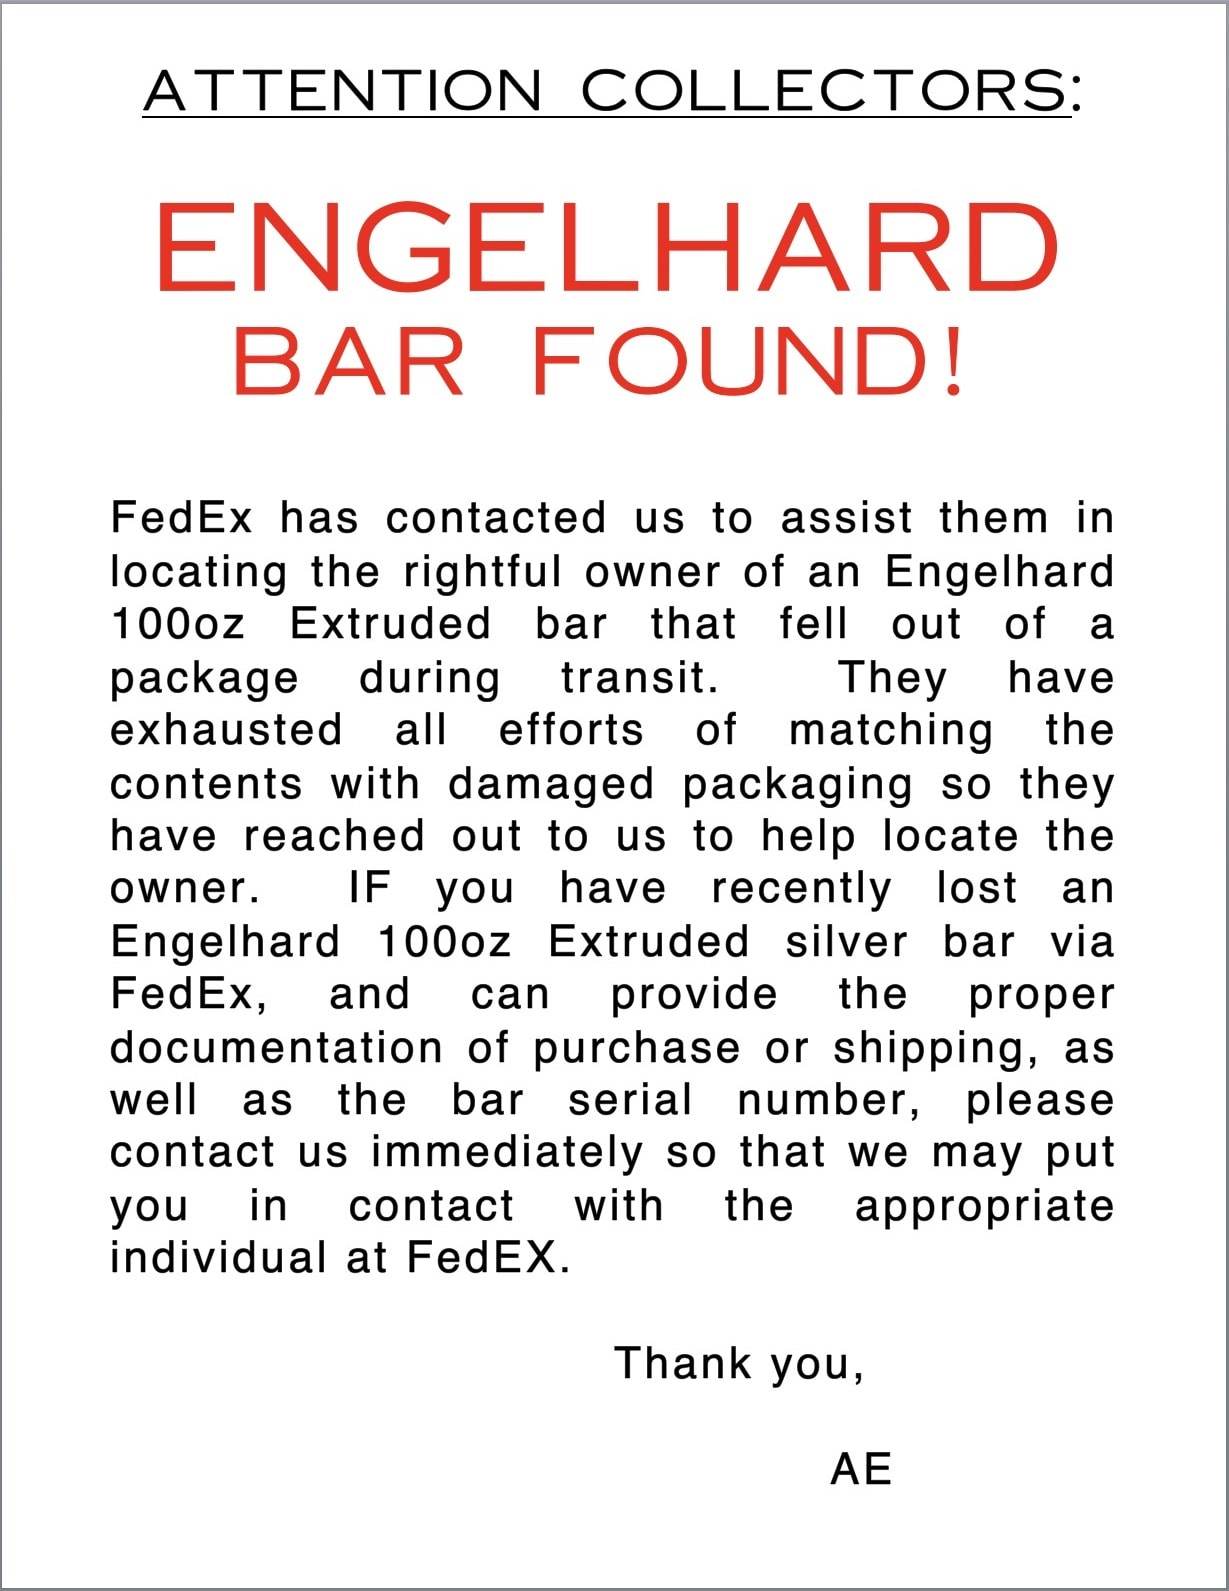 Attention Collectors - Engelhard Bar Found!